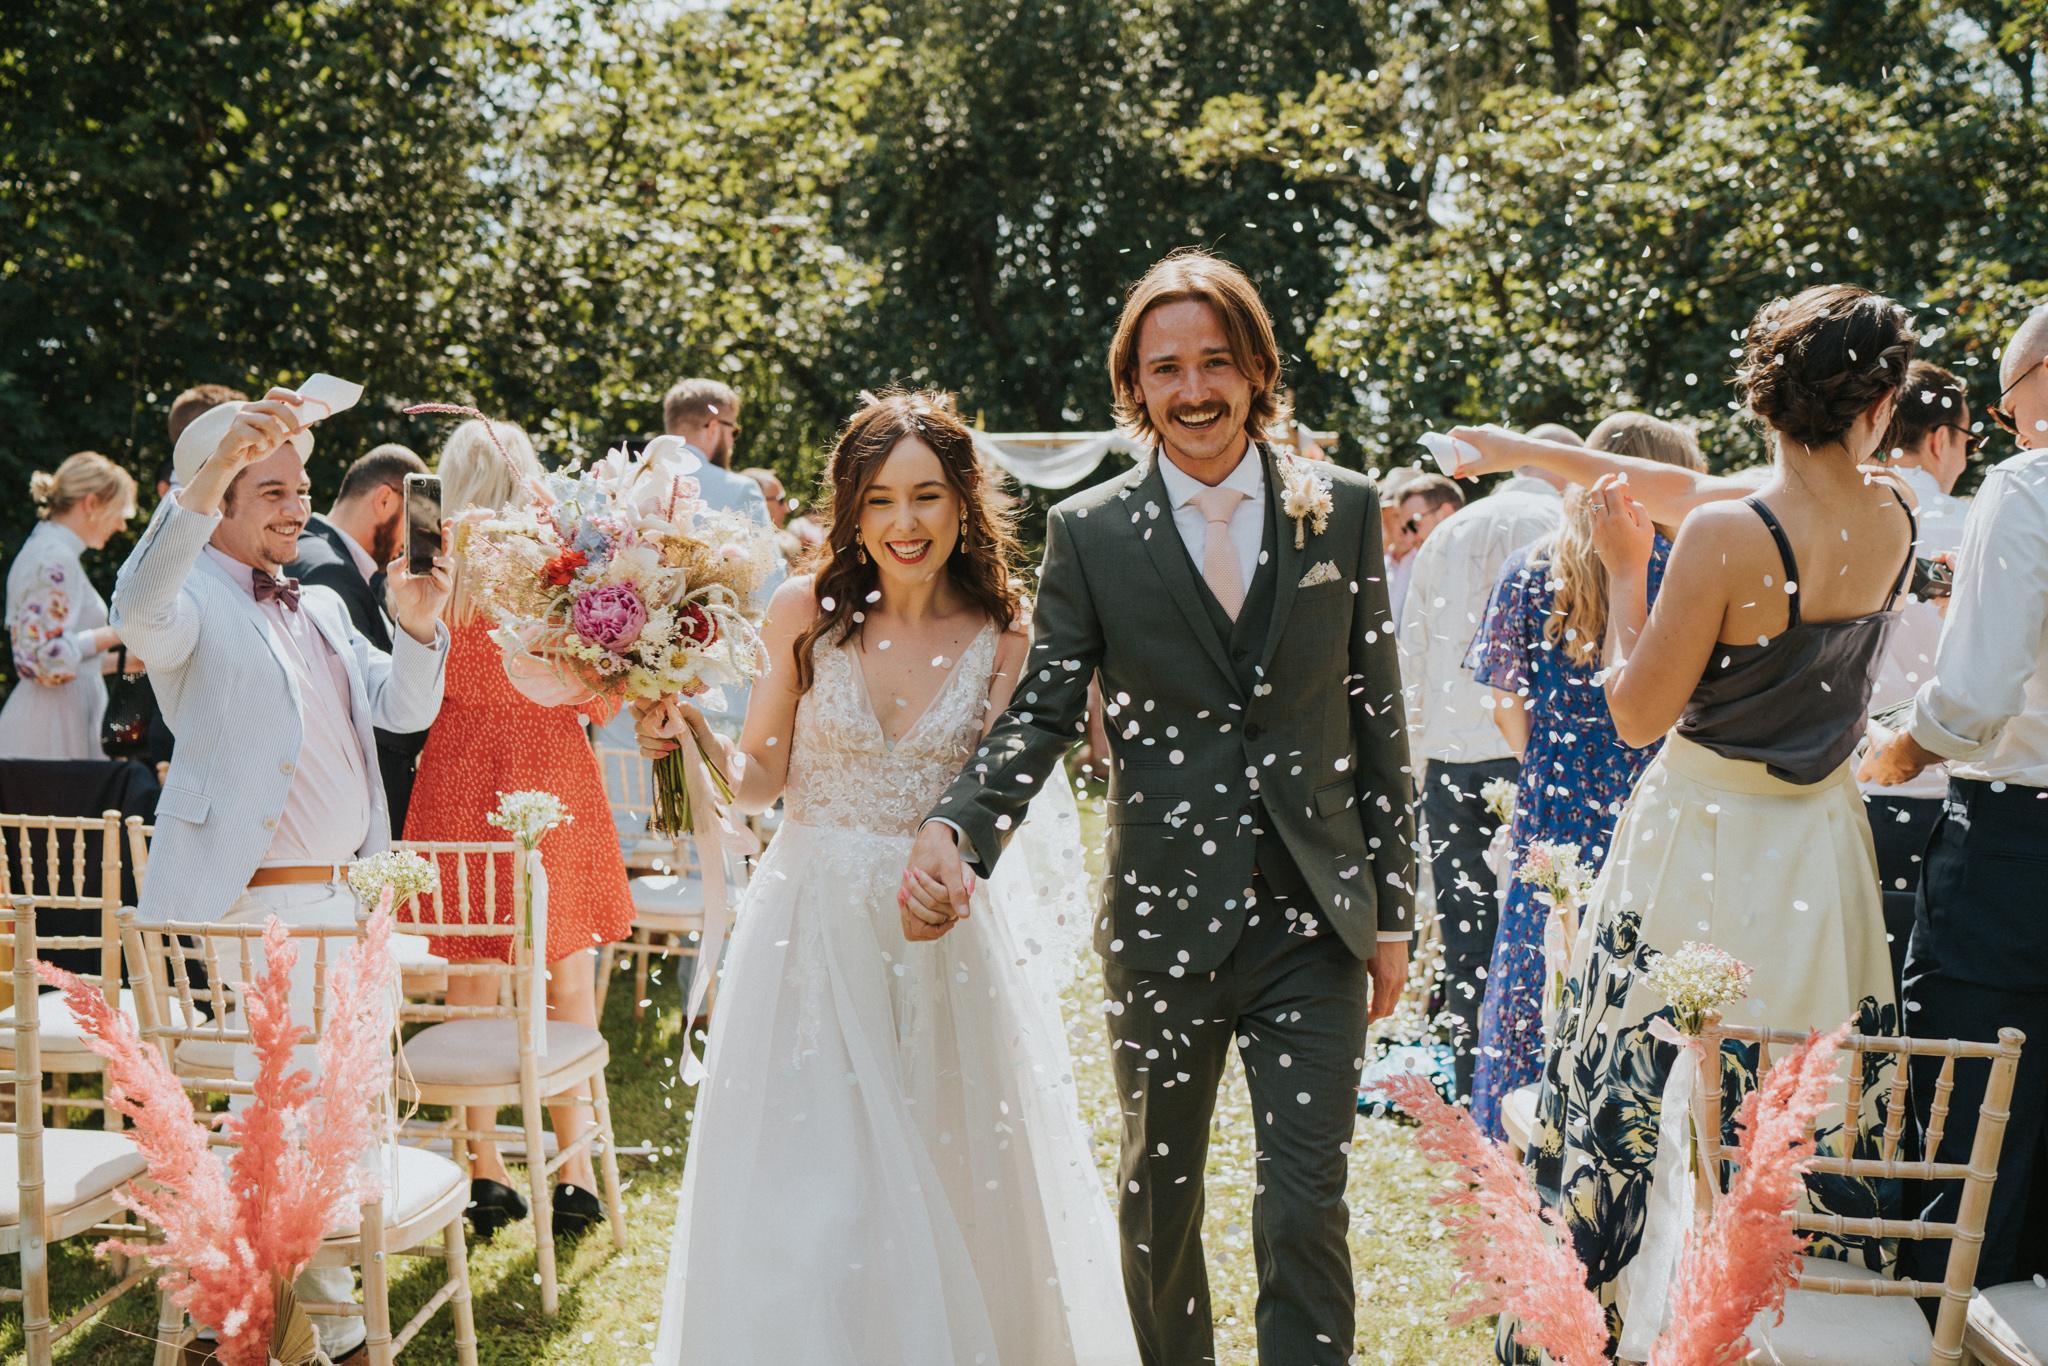 emi-Jack-boho-diy-wedding-eggington-house-grace-elizabeth-colchester-essex-alternative-wedding-photographer-suffolk-norfolk-devon (19 of 56).jpg